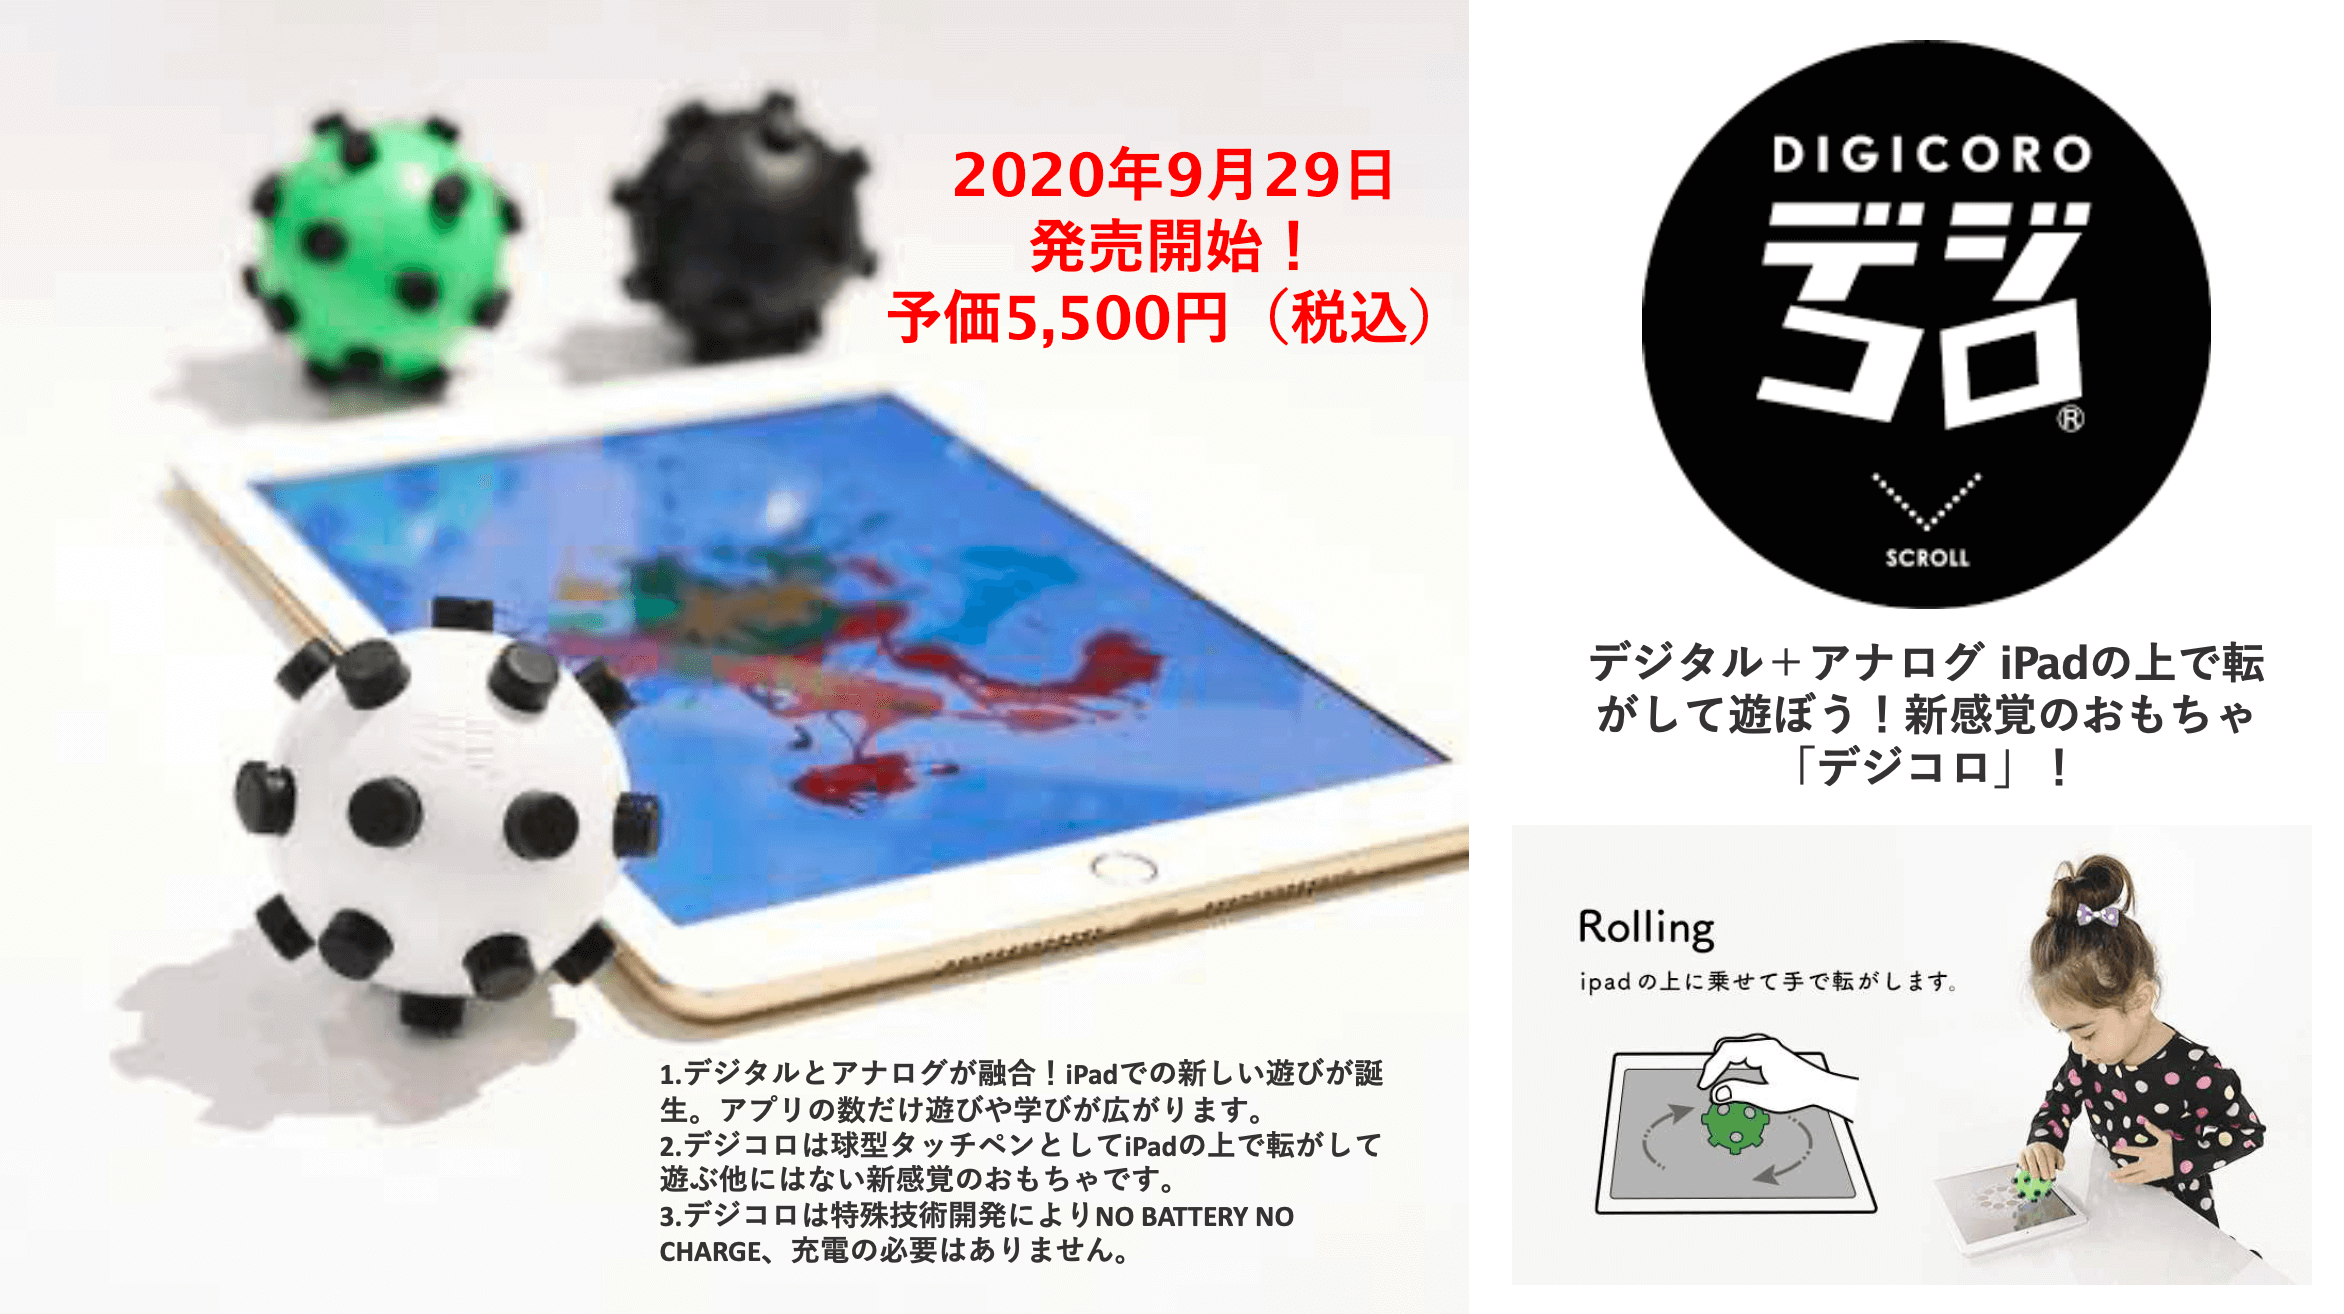 ASOBISKI(アソビスキー)『デジタルトイ(タブレット・アプリや電子回路ブロックを使用する玩具の展開)』